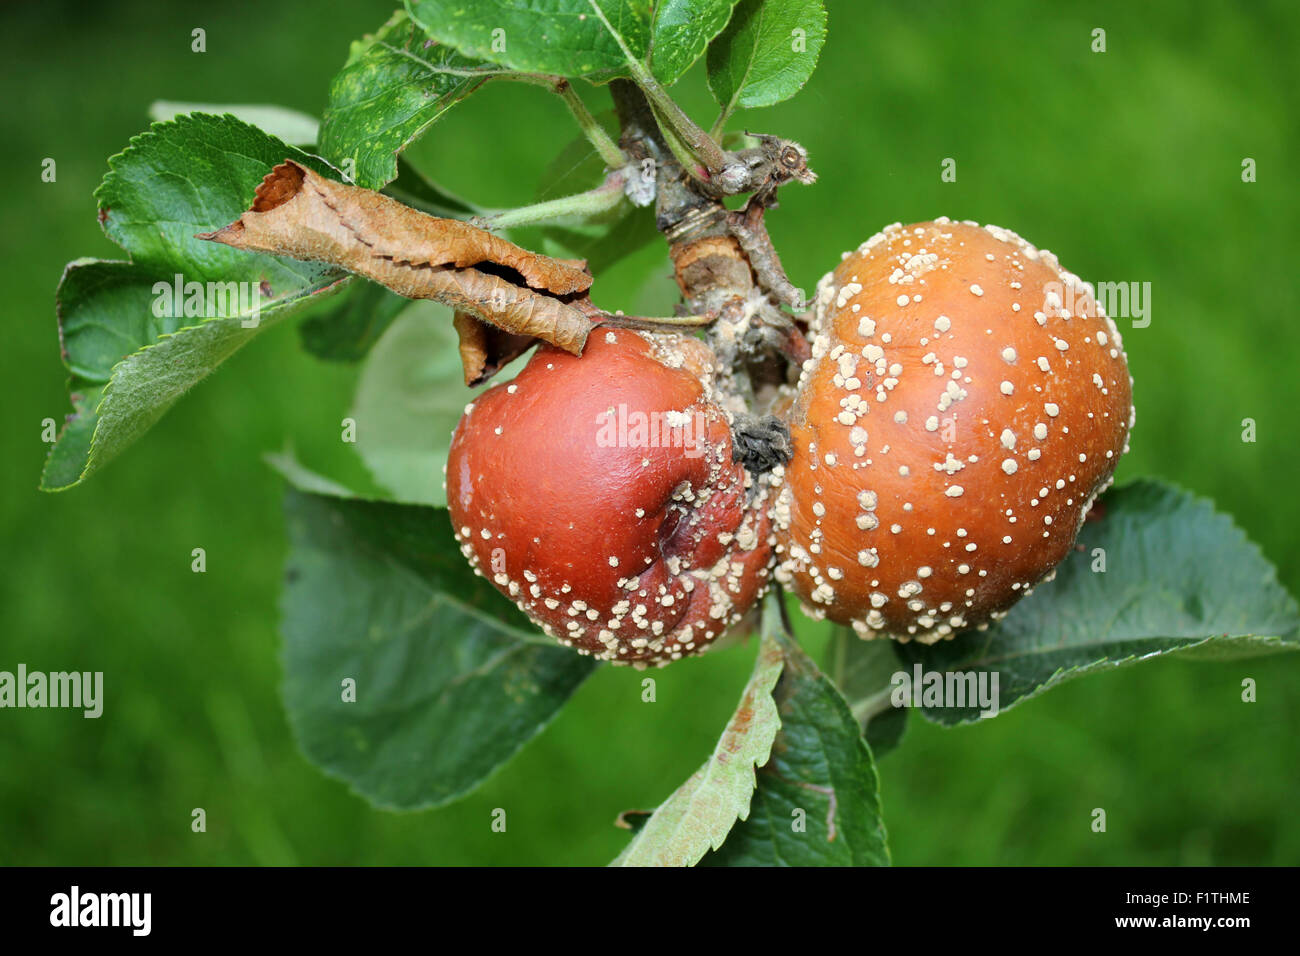 Brown Rot Fungal Disease On Apples - Stock Image